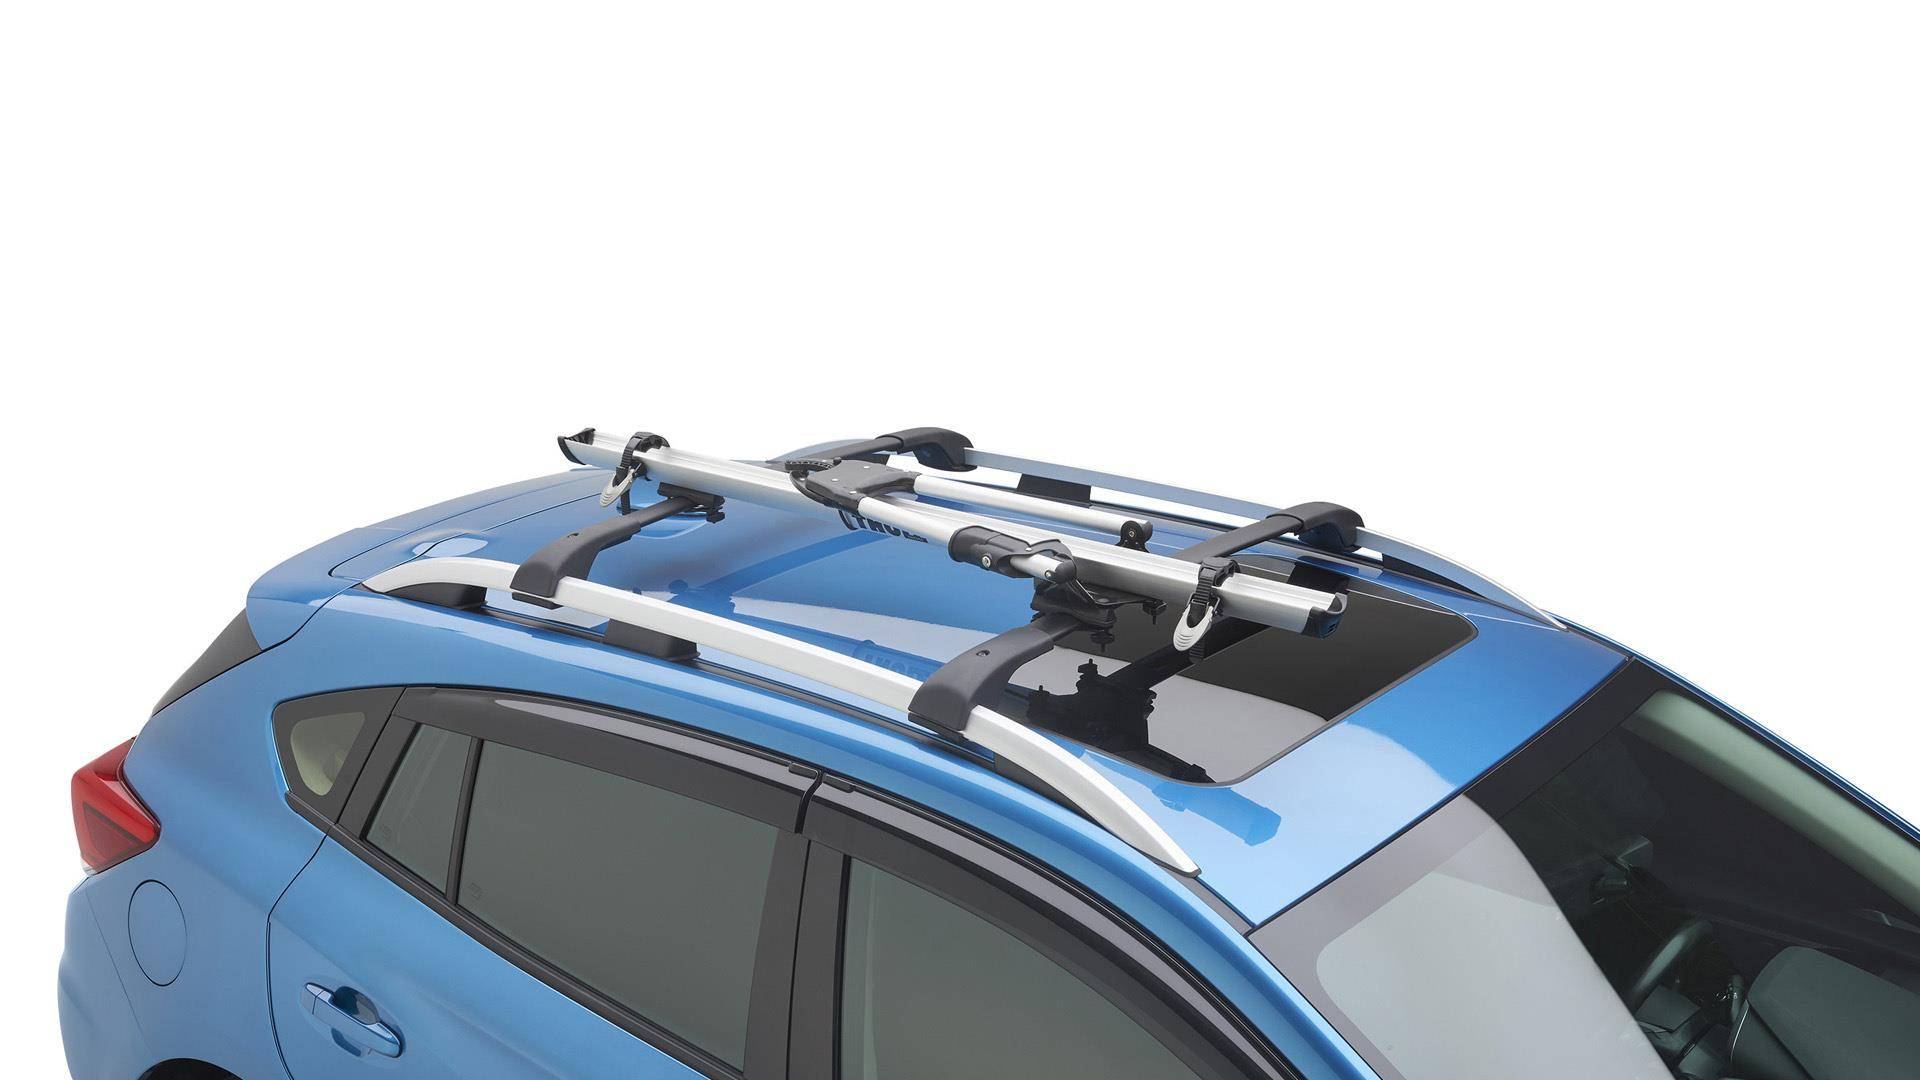 Soa567b020 Subaru Thule Bike Carrier Roof Mounted